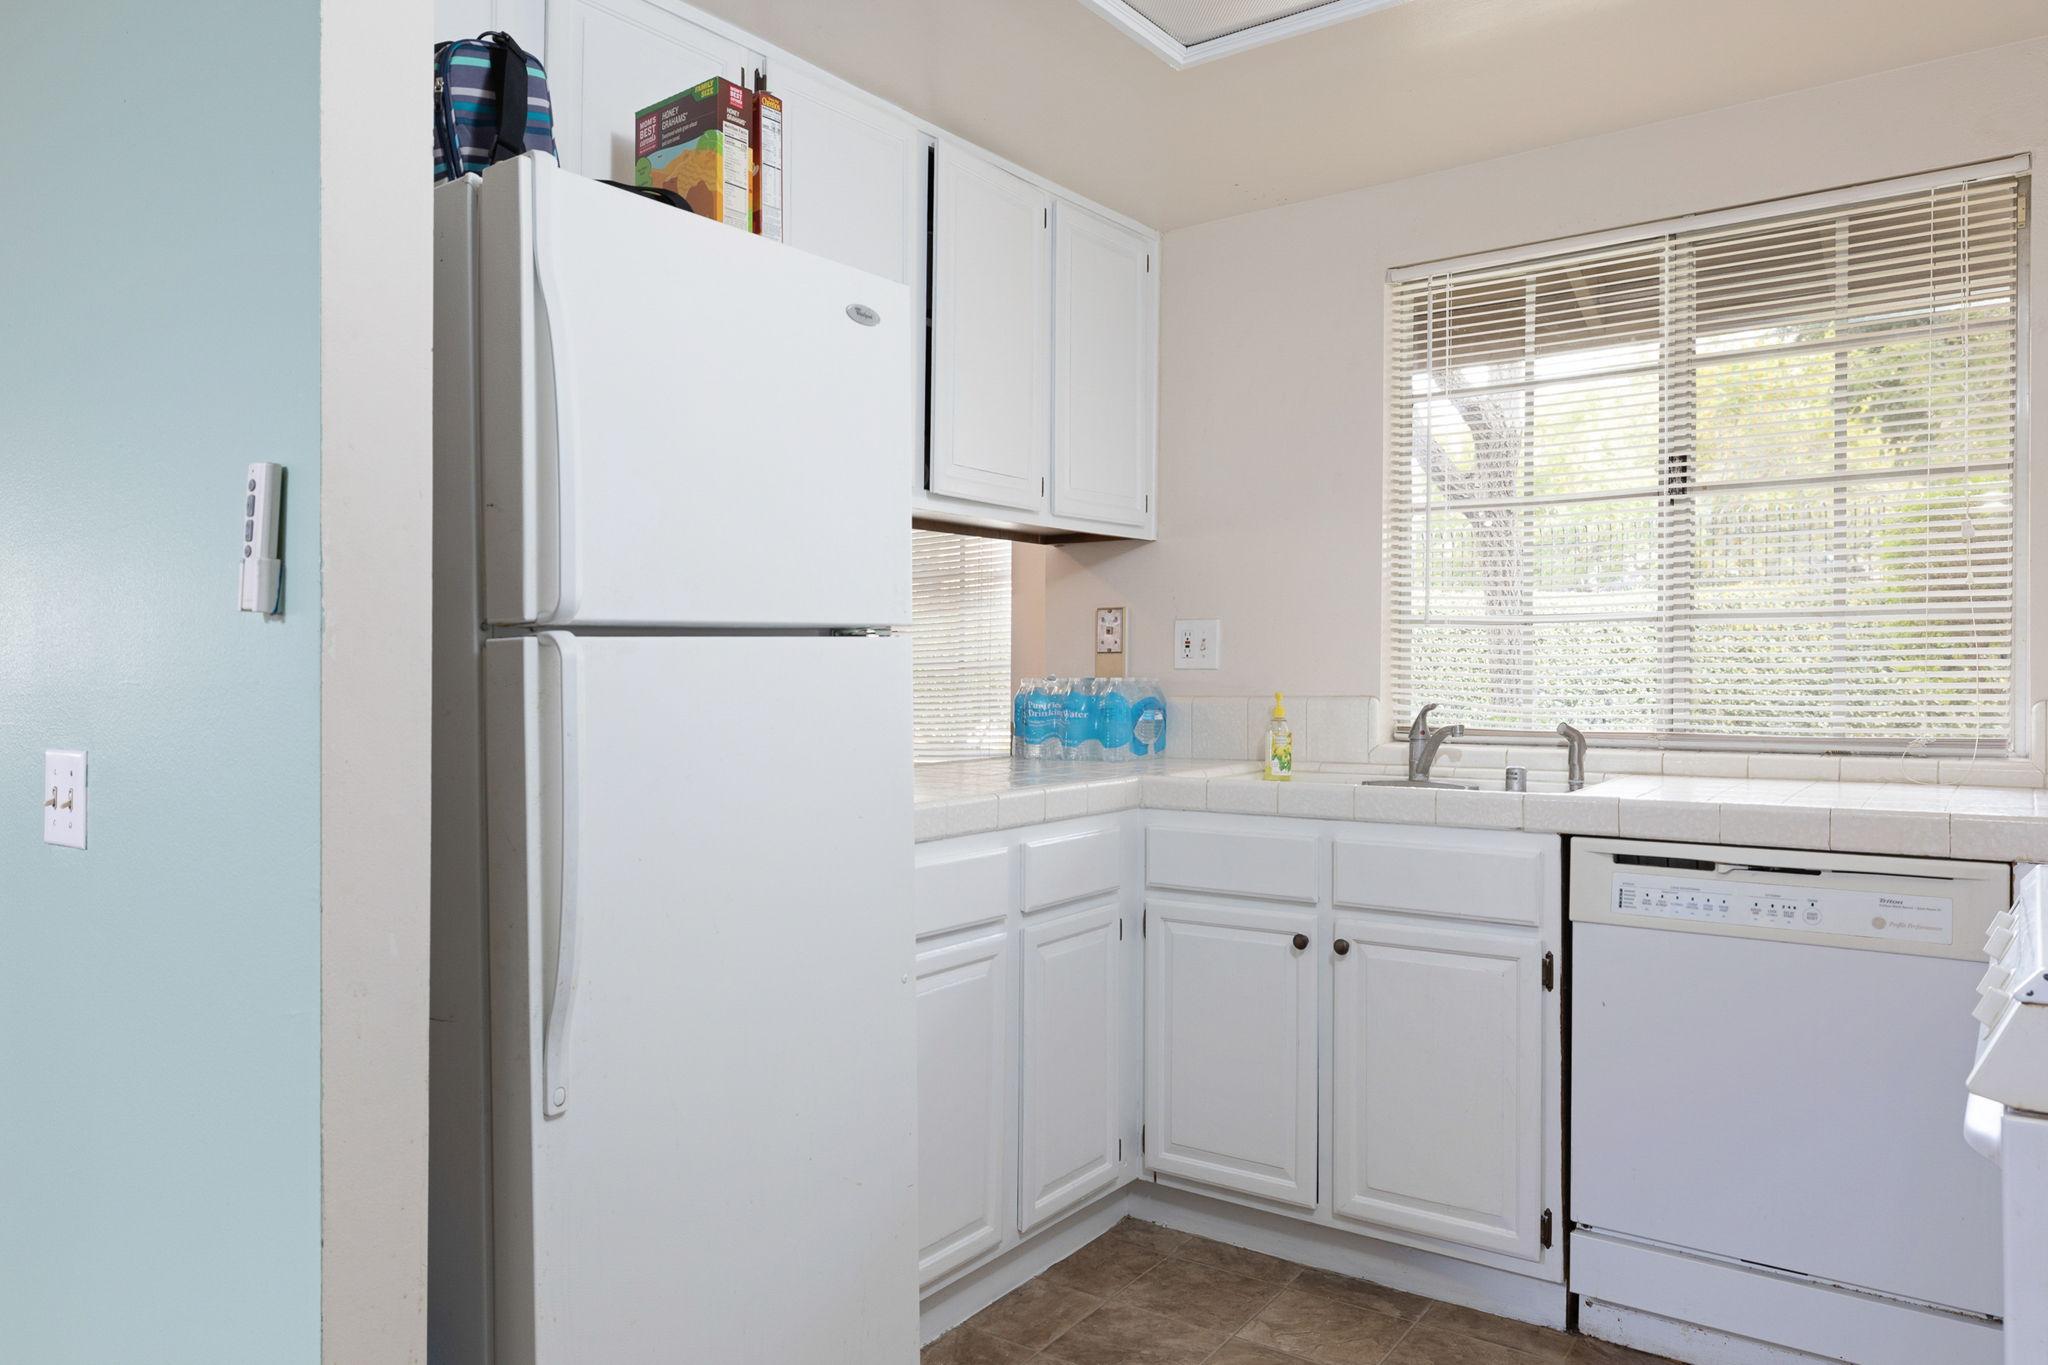 Plenty of storage in kitchen